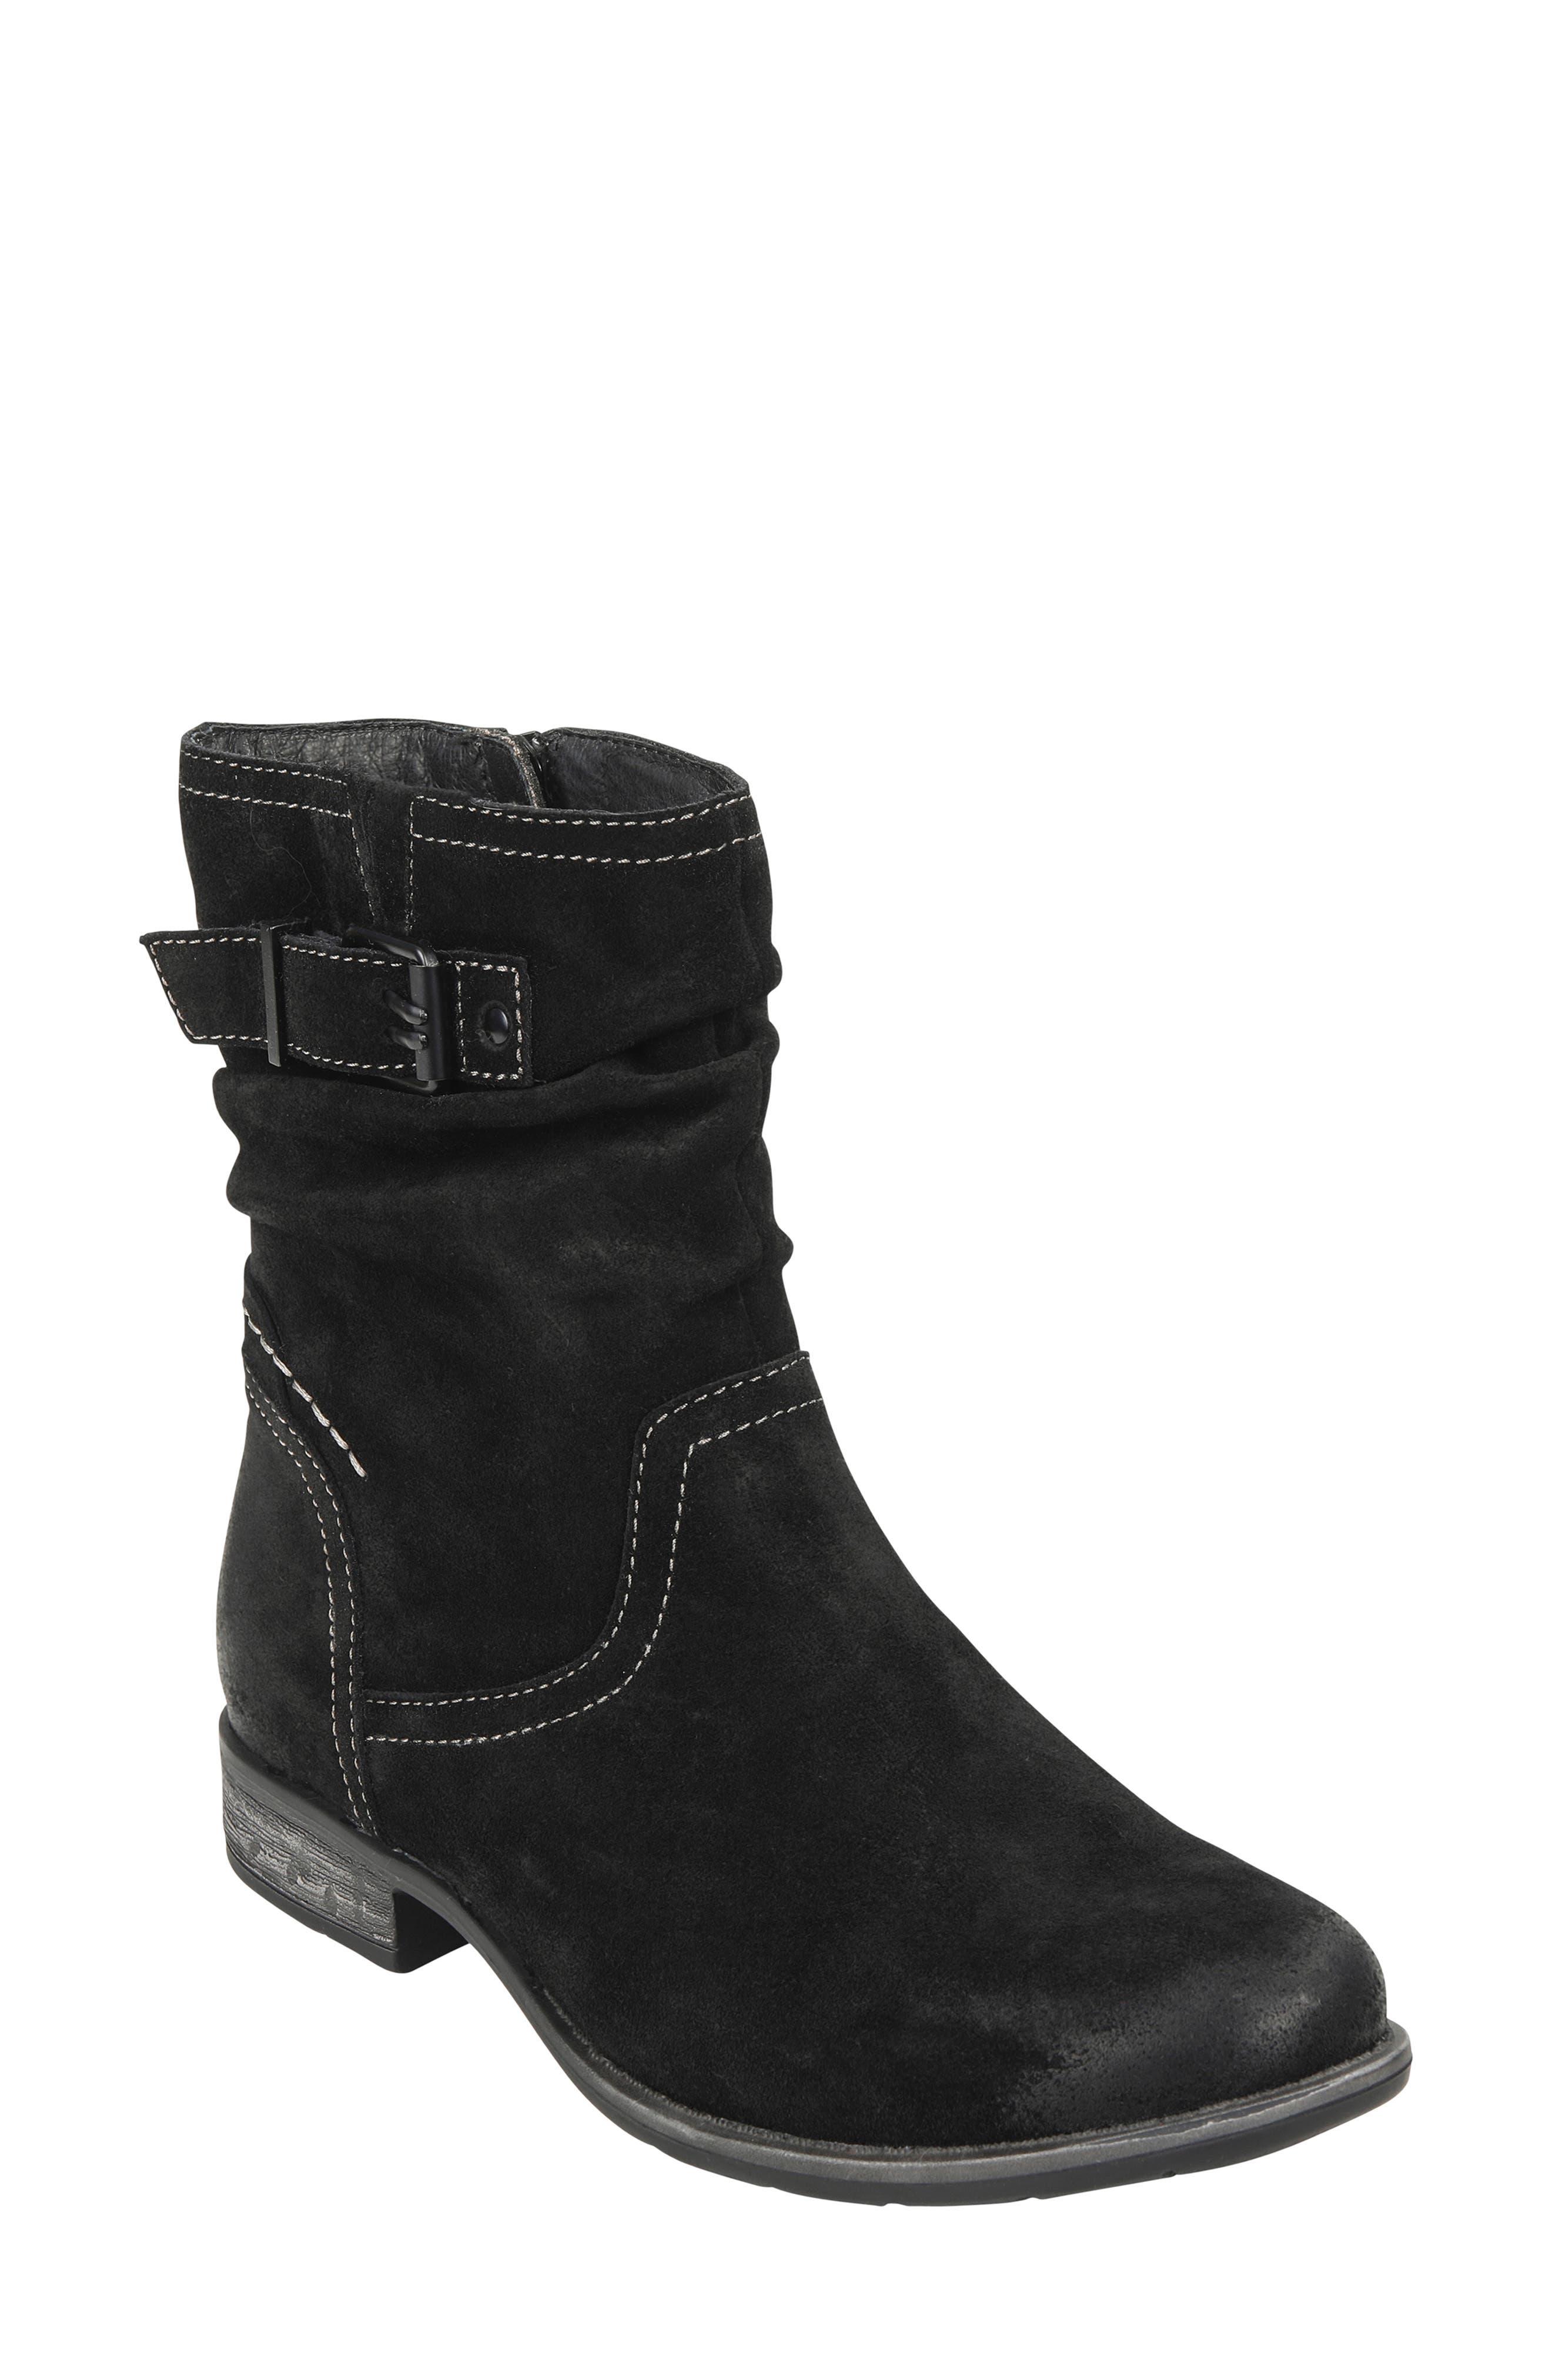 Earth Beaufort Boot, Black